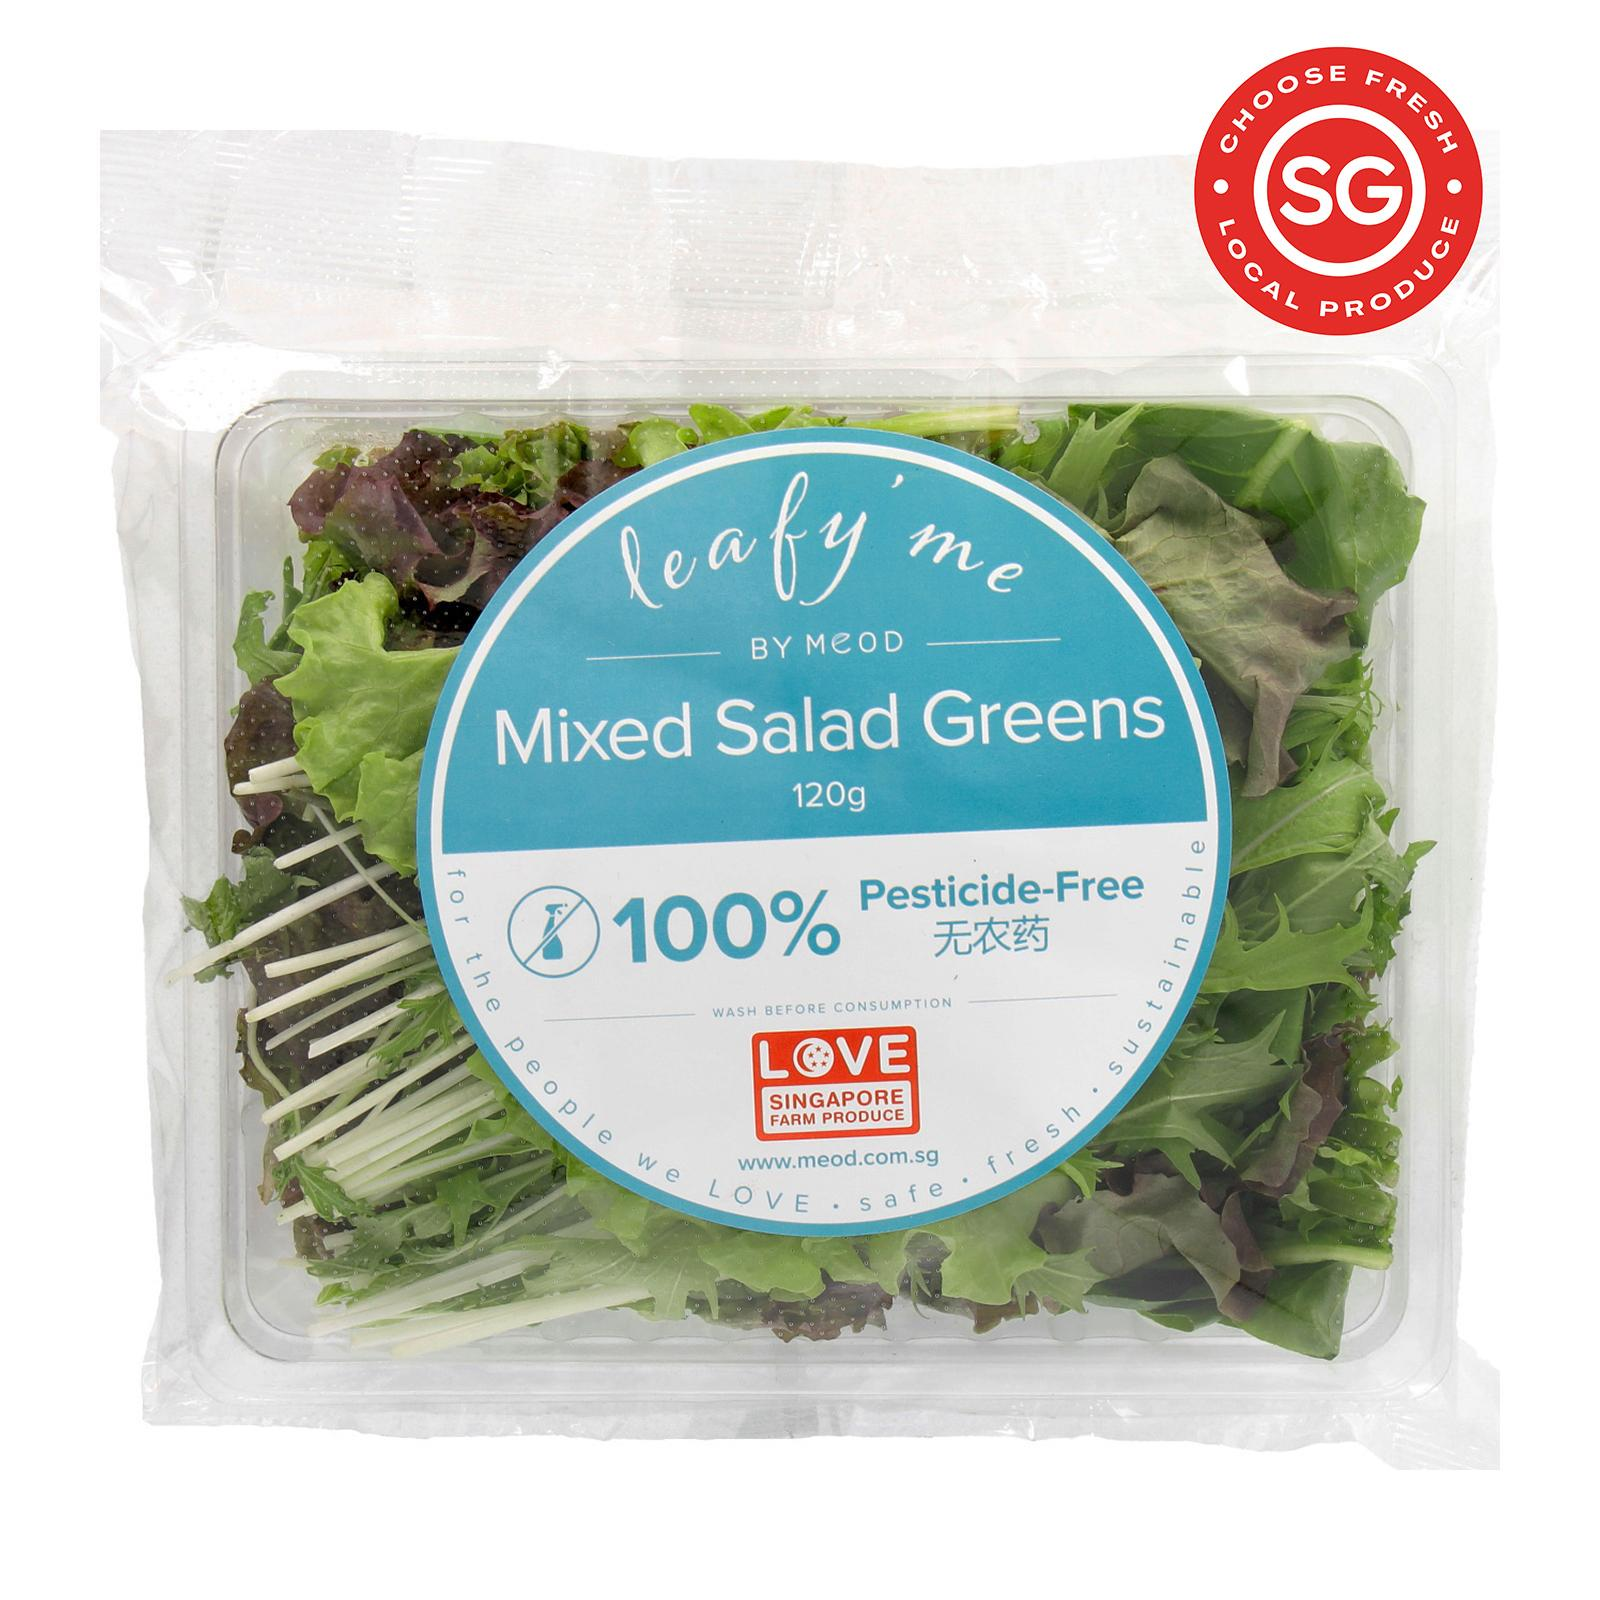 MEOD Leafy'Me Mixed Salad Greens